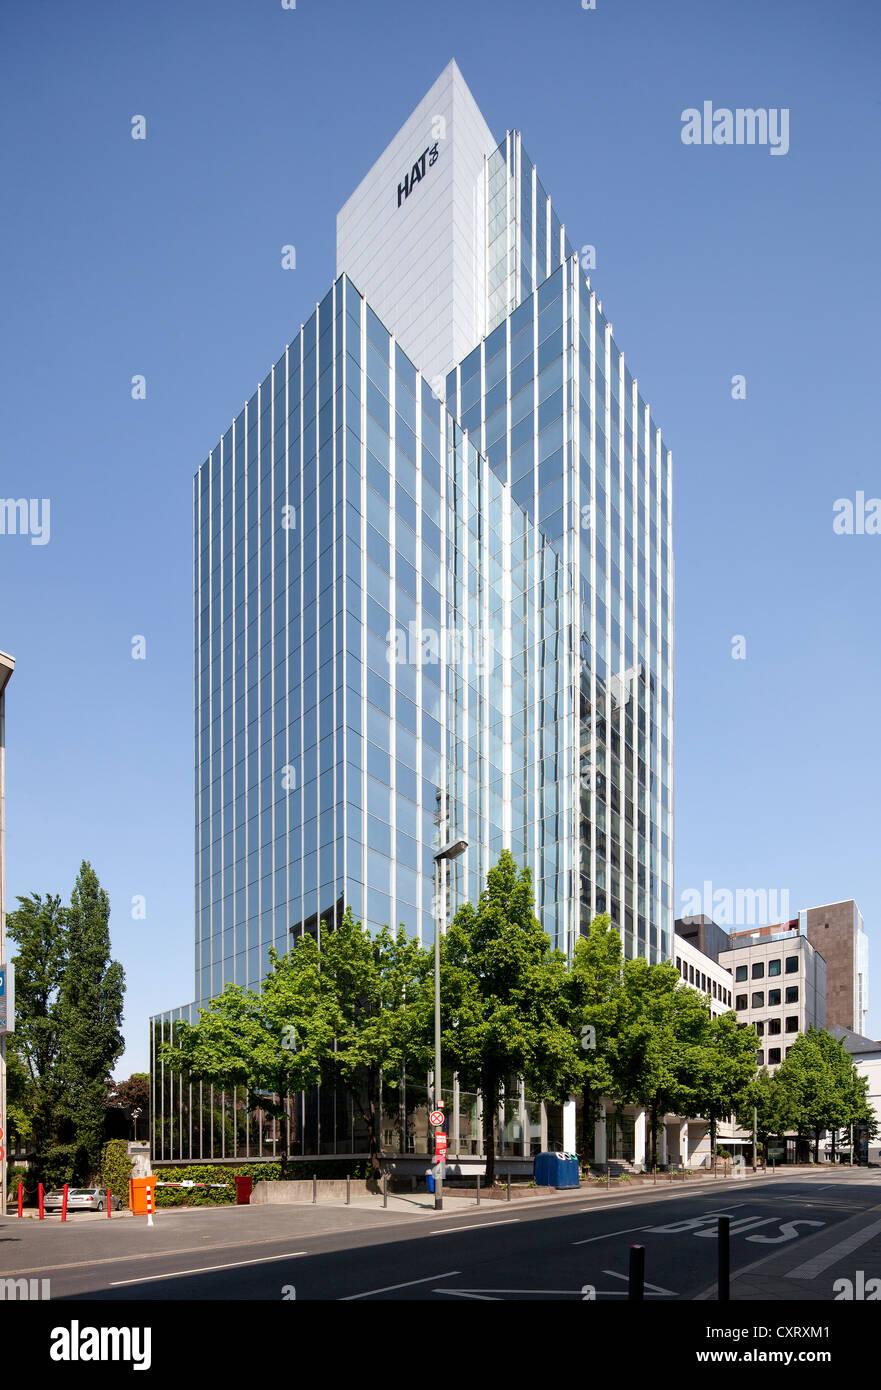 Hochhaus am Turm tower, HAT 64, Frankfurt am Main, Hesse, Germany, Europe, PublicGround - Stock Image